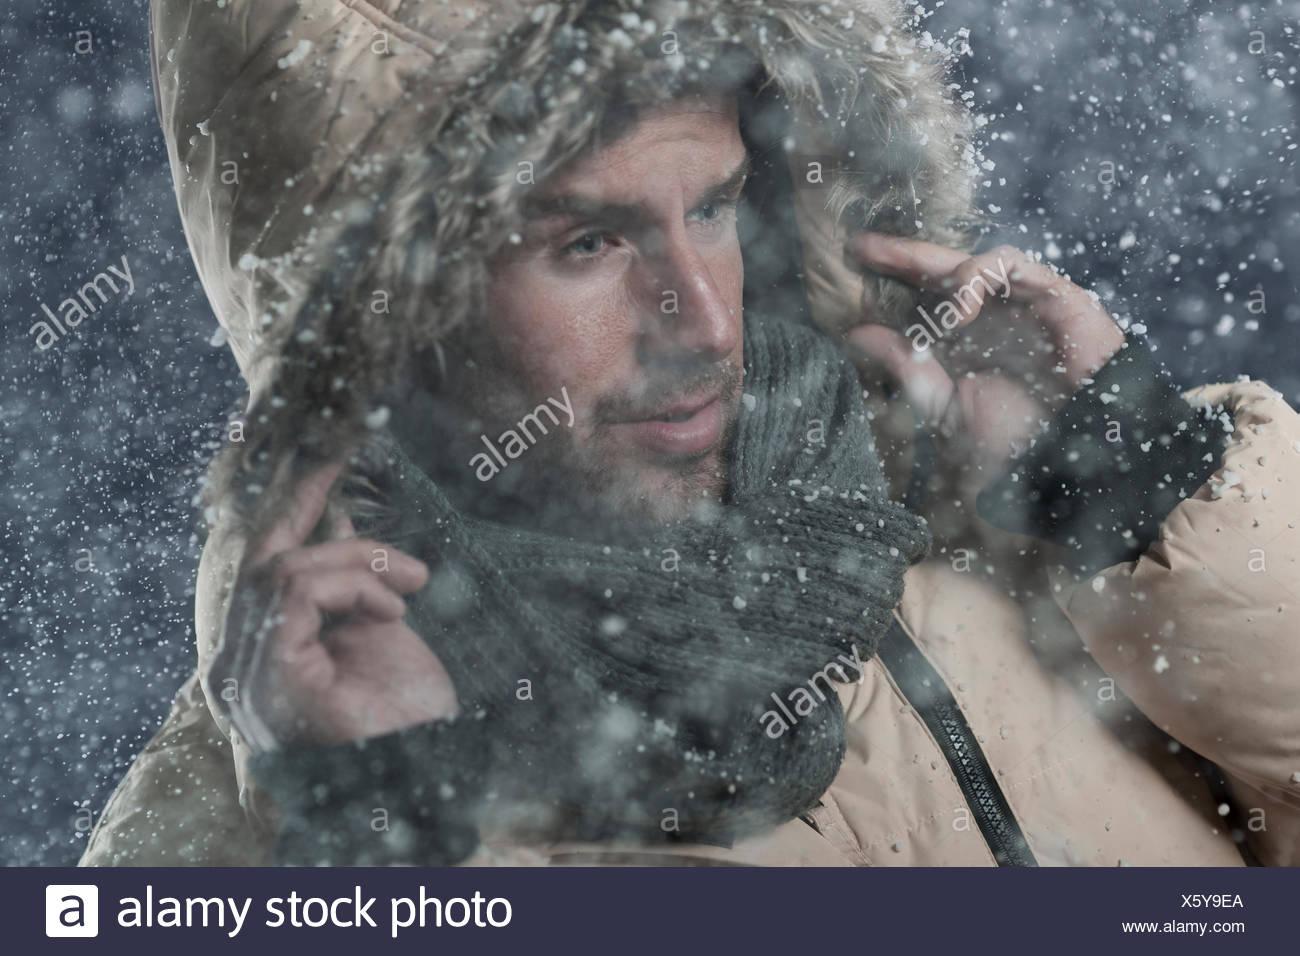 Bad weather in winter season. Debica, Poland - Stock Image